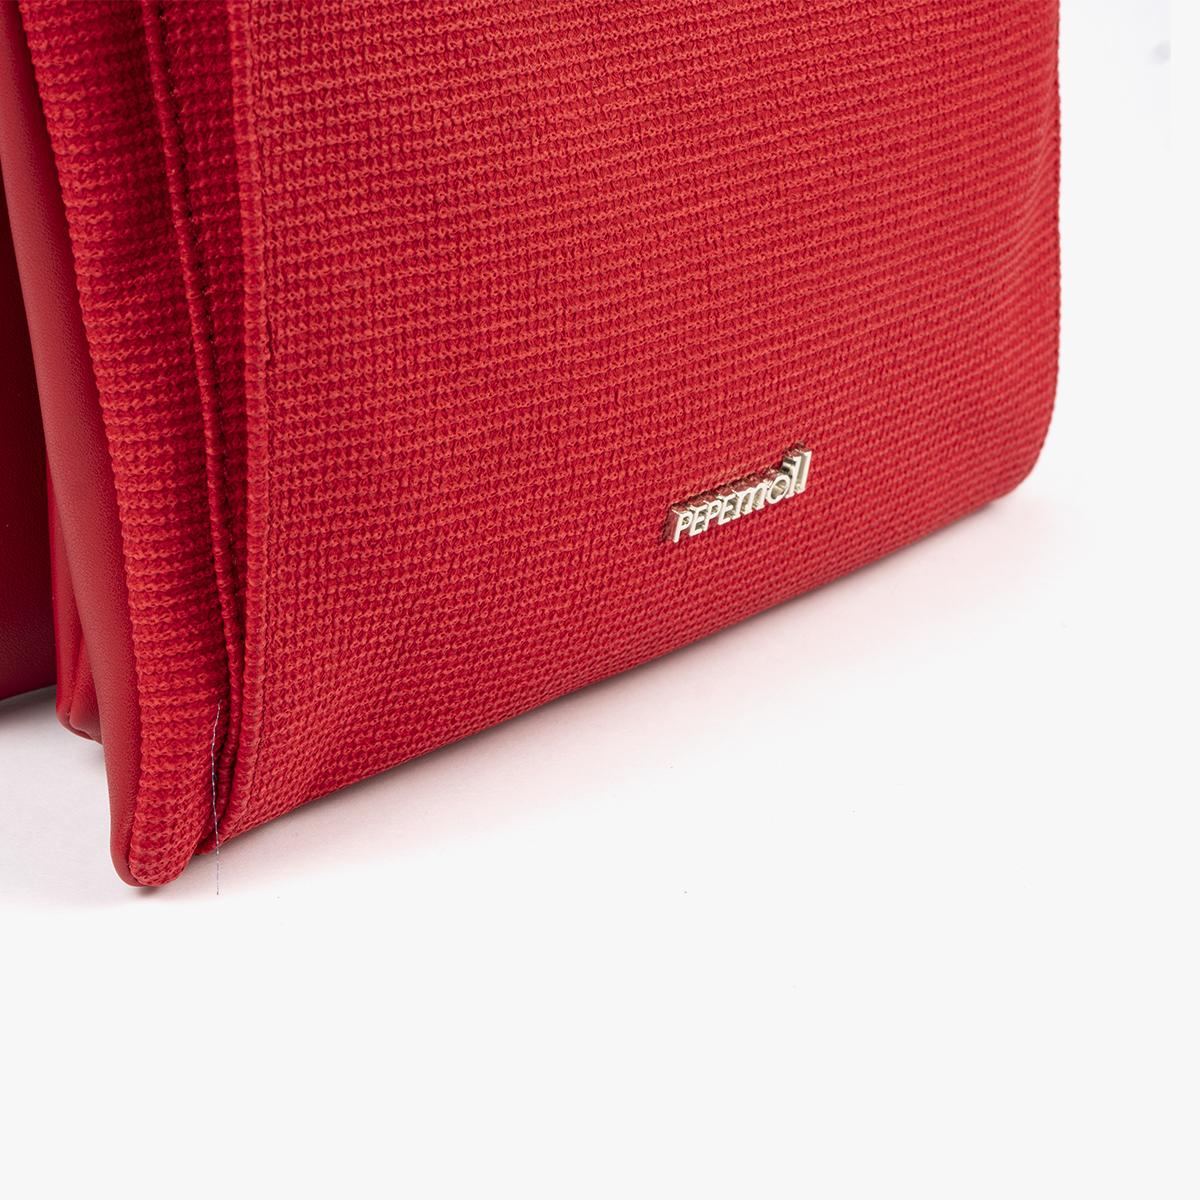 53068 bolso bandolera rojo pepemoll